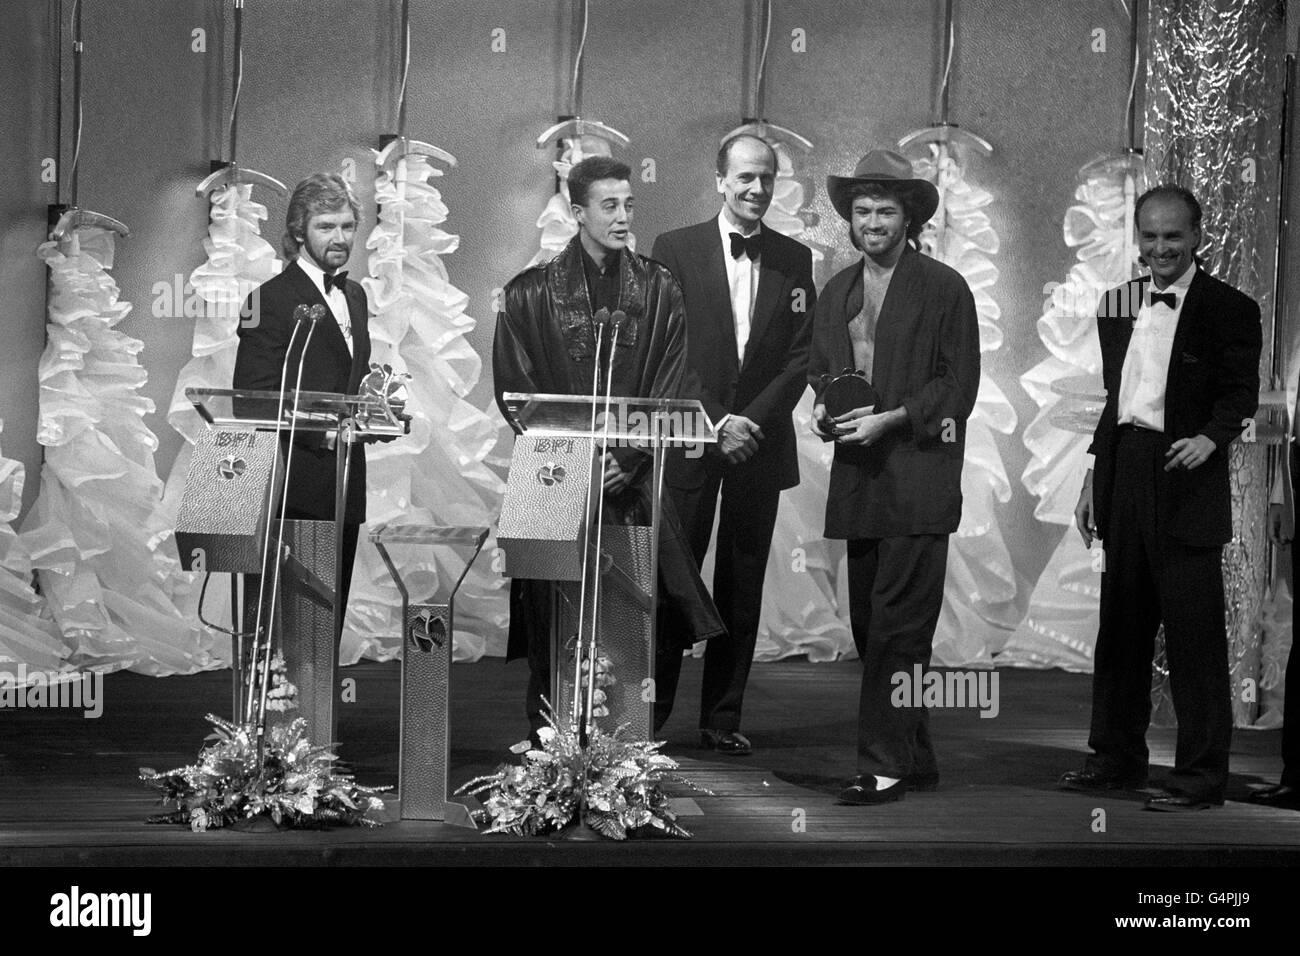 Music - British Phonographic Industry Awards (Brits) - Grovsvenor House London - Stock Image